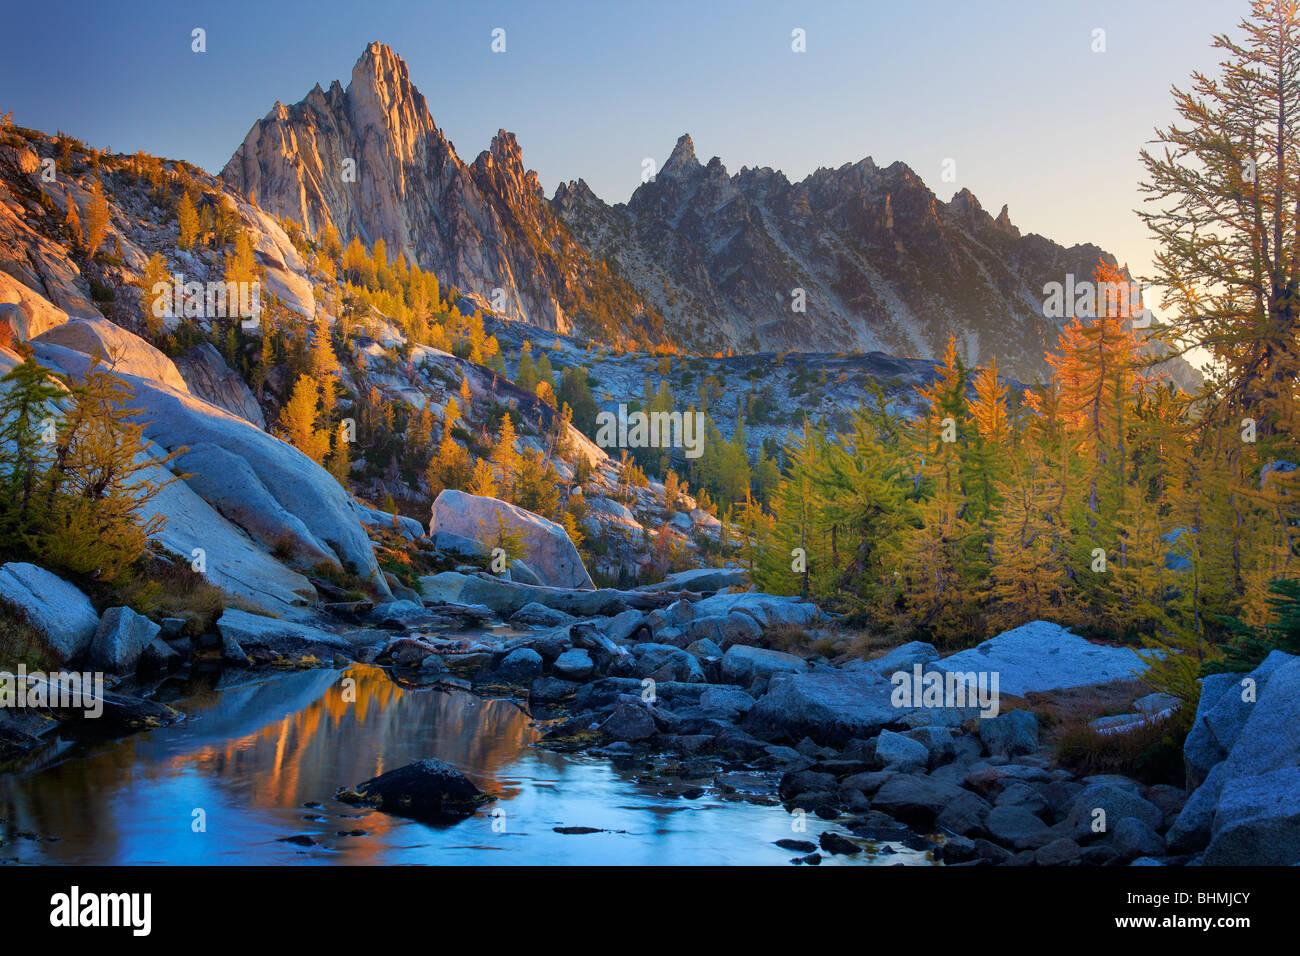 Larch trees at Enchantment Lakes - Stock Image